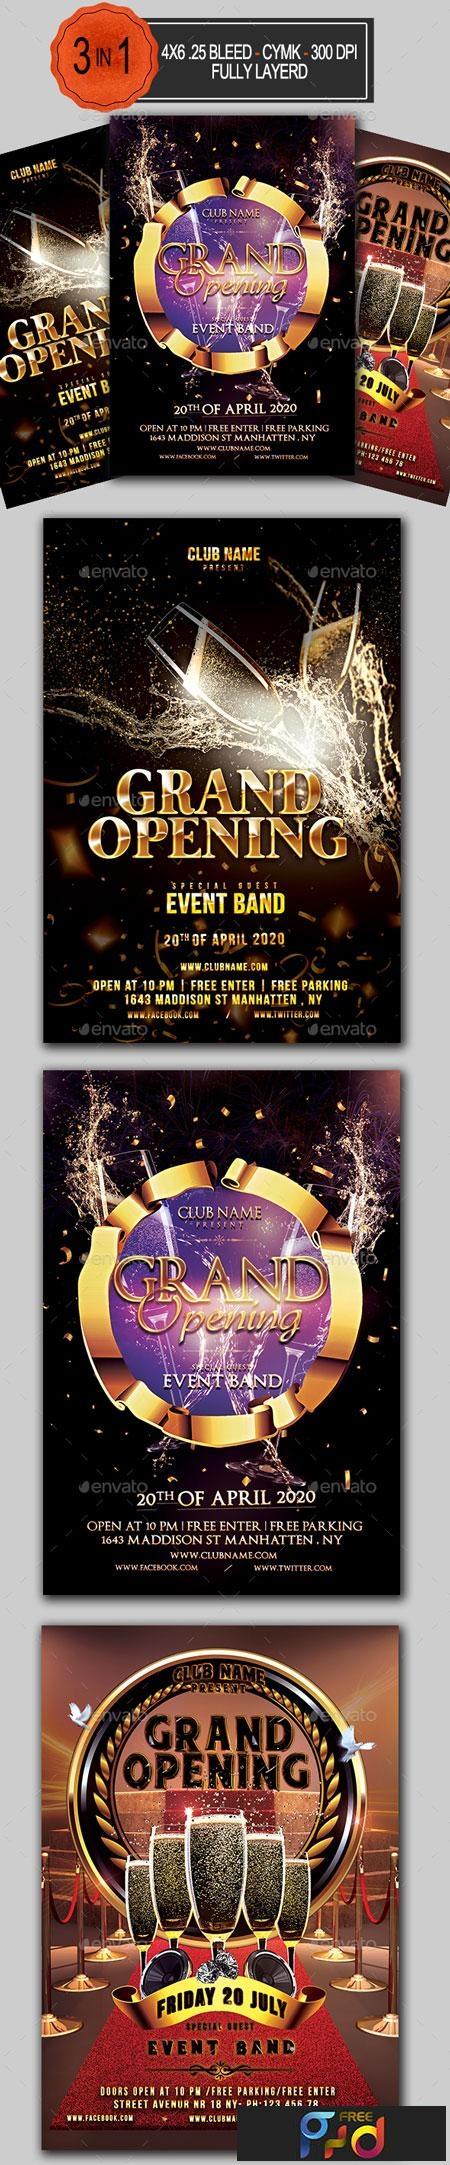 Grand Opening Flyer Bundle 22717388 1